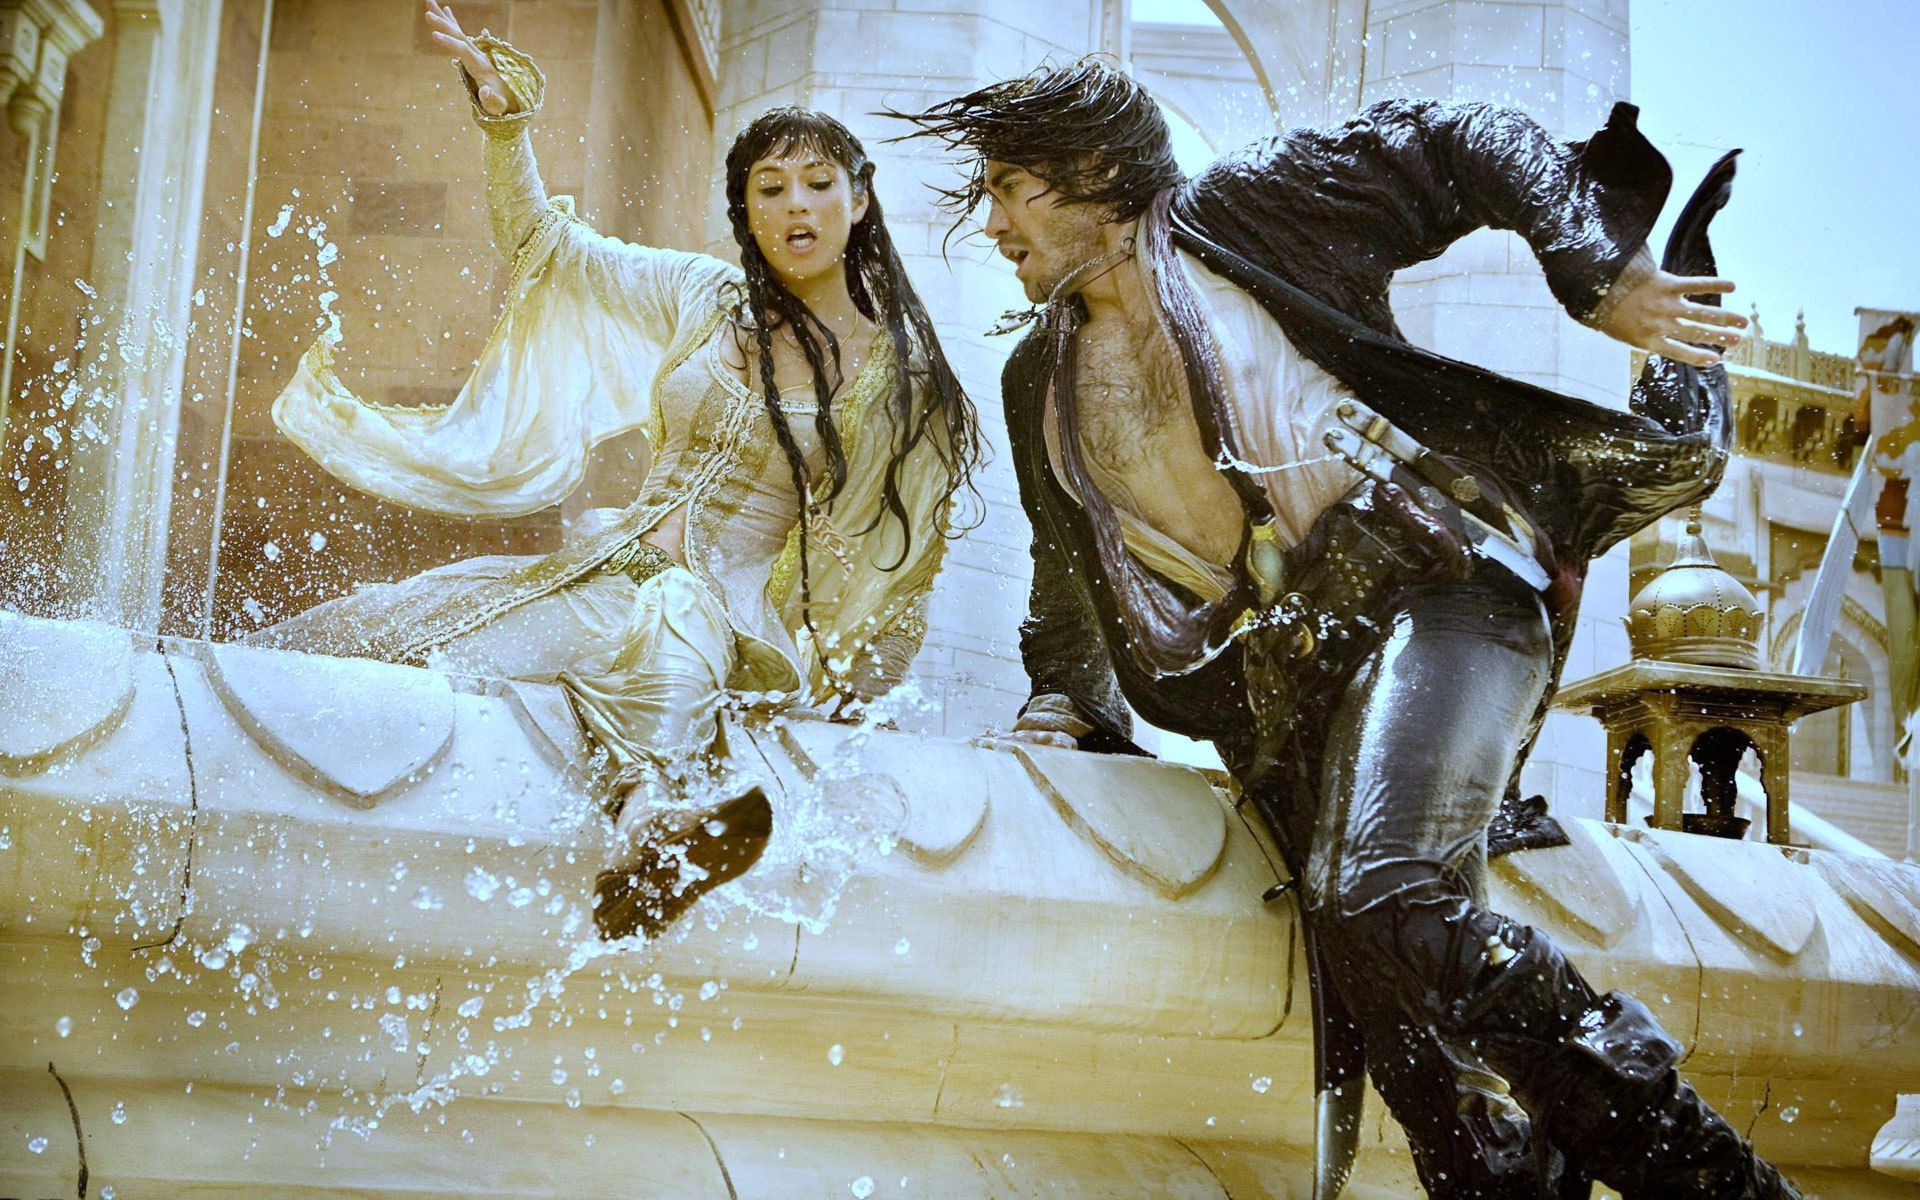 Fantastic Wallpaper Movie Prince Persia - gemma-arterton-prince-of-persia-wallpaper-16  Pictures_1002025.jpg